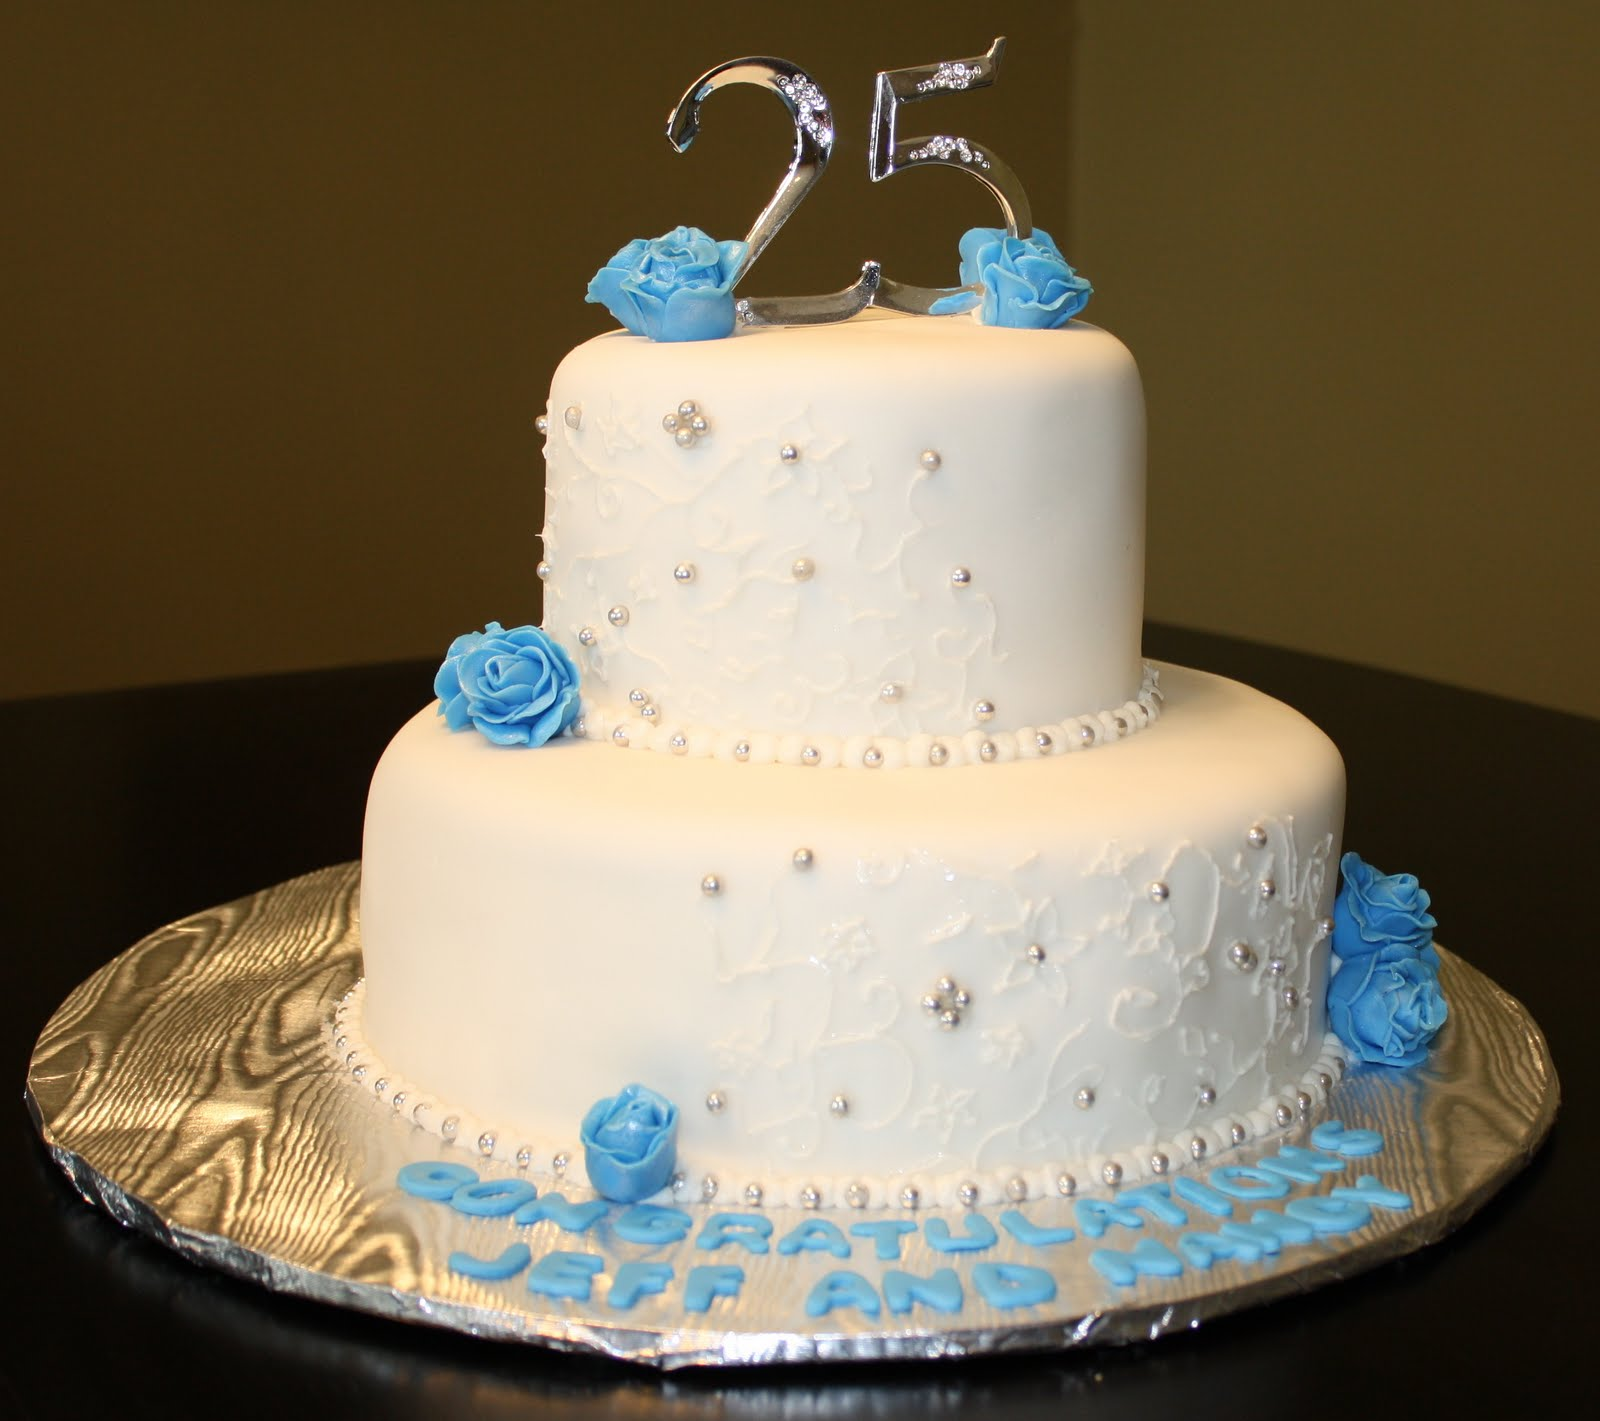 The 25 Best Wedding Cakes: Hock Cakes LLC: 25th Wedding Anniversary